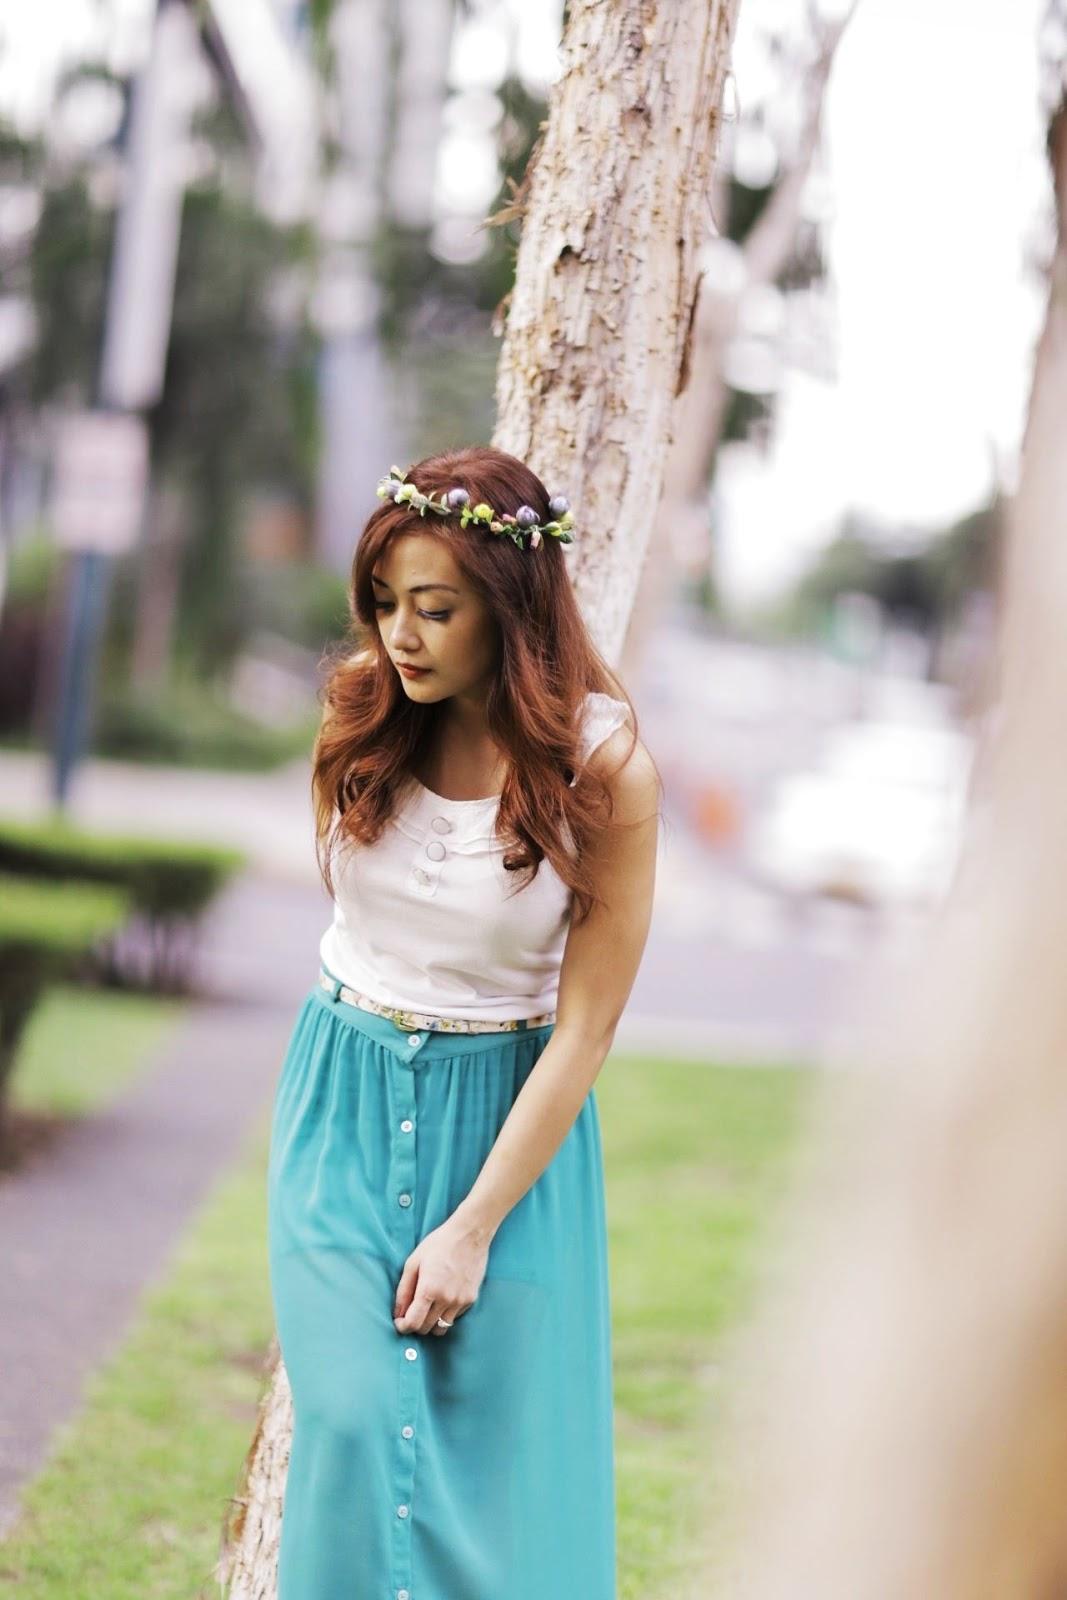 Pixies, head dress, head wreath, the trees burgos circle, BGC, sisters